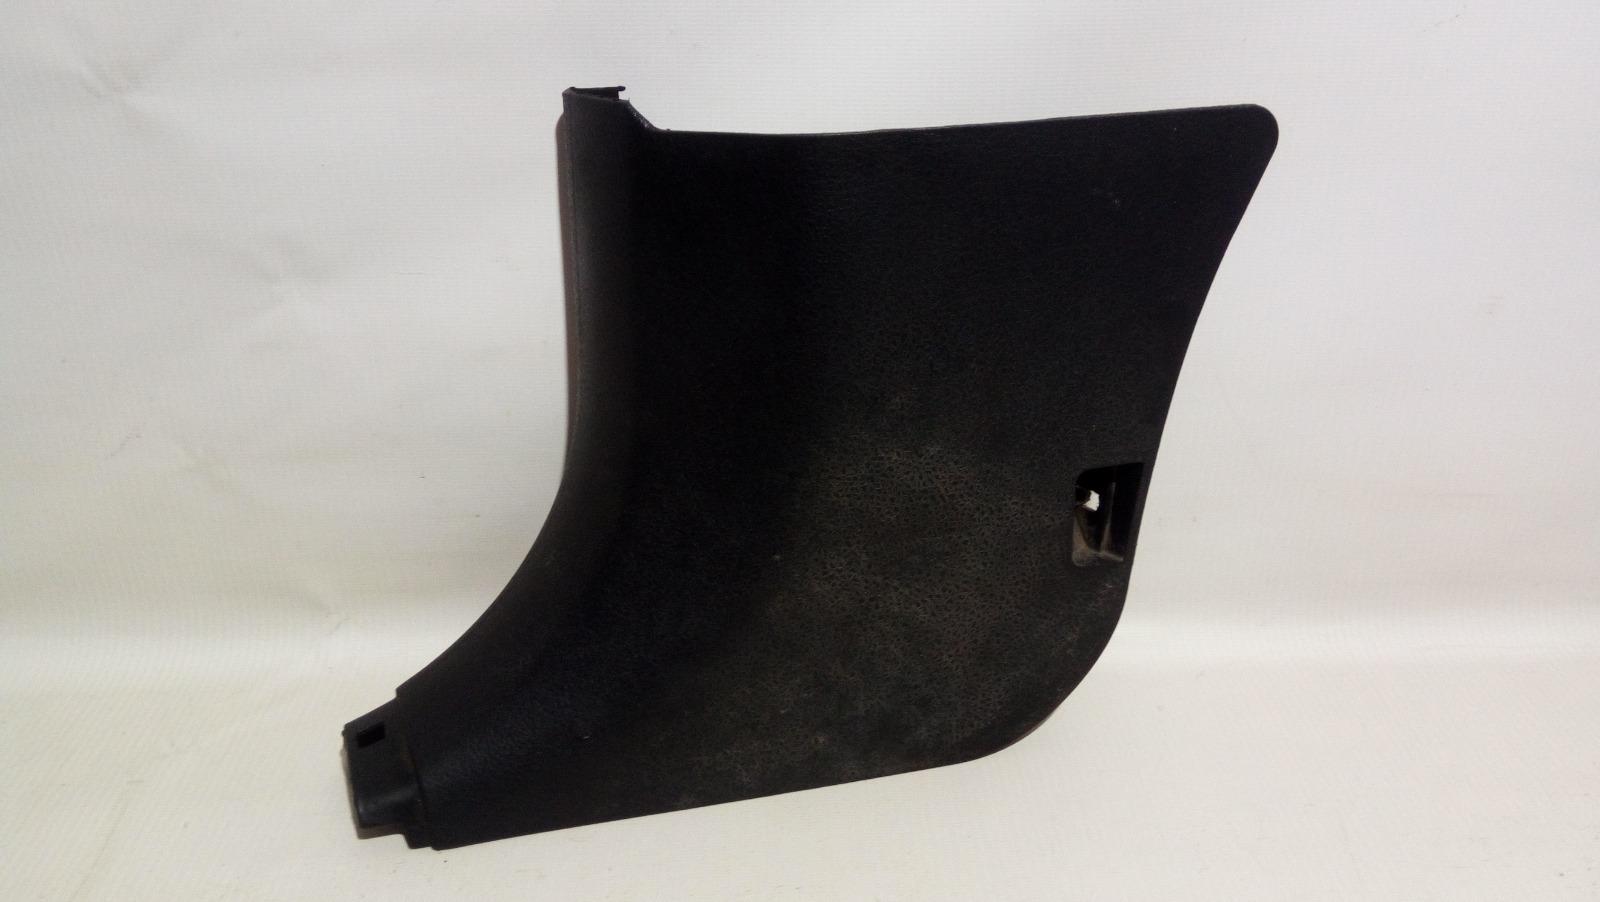 Обшивка, панель салона Geely Mk Cross 5A-FE 2013 передний левый нижний